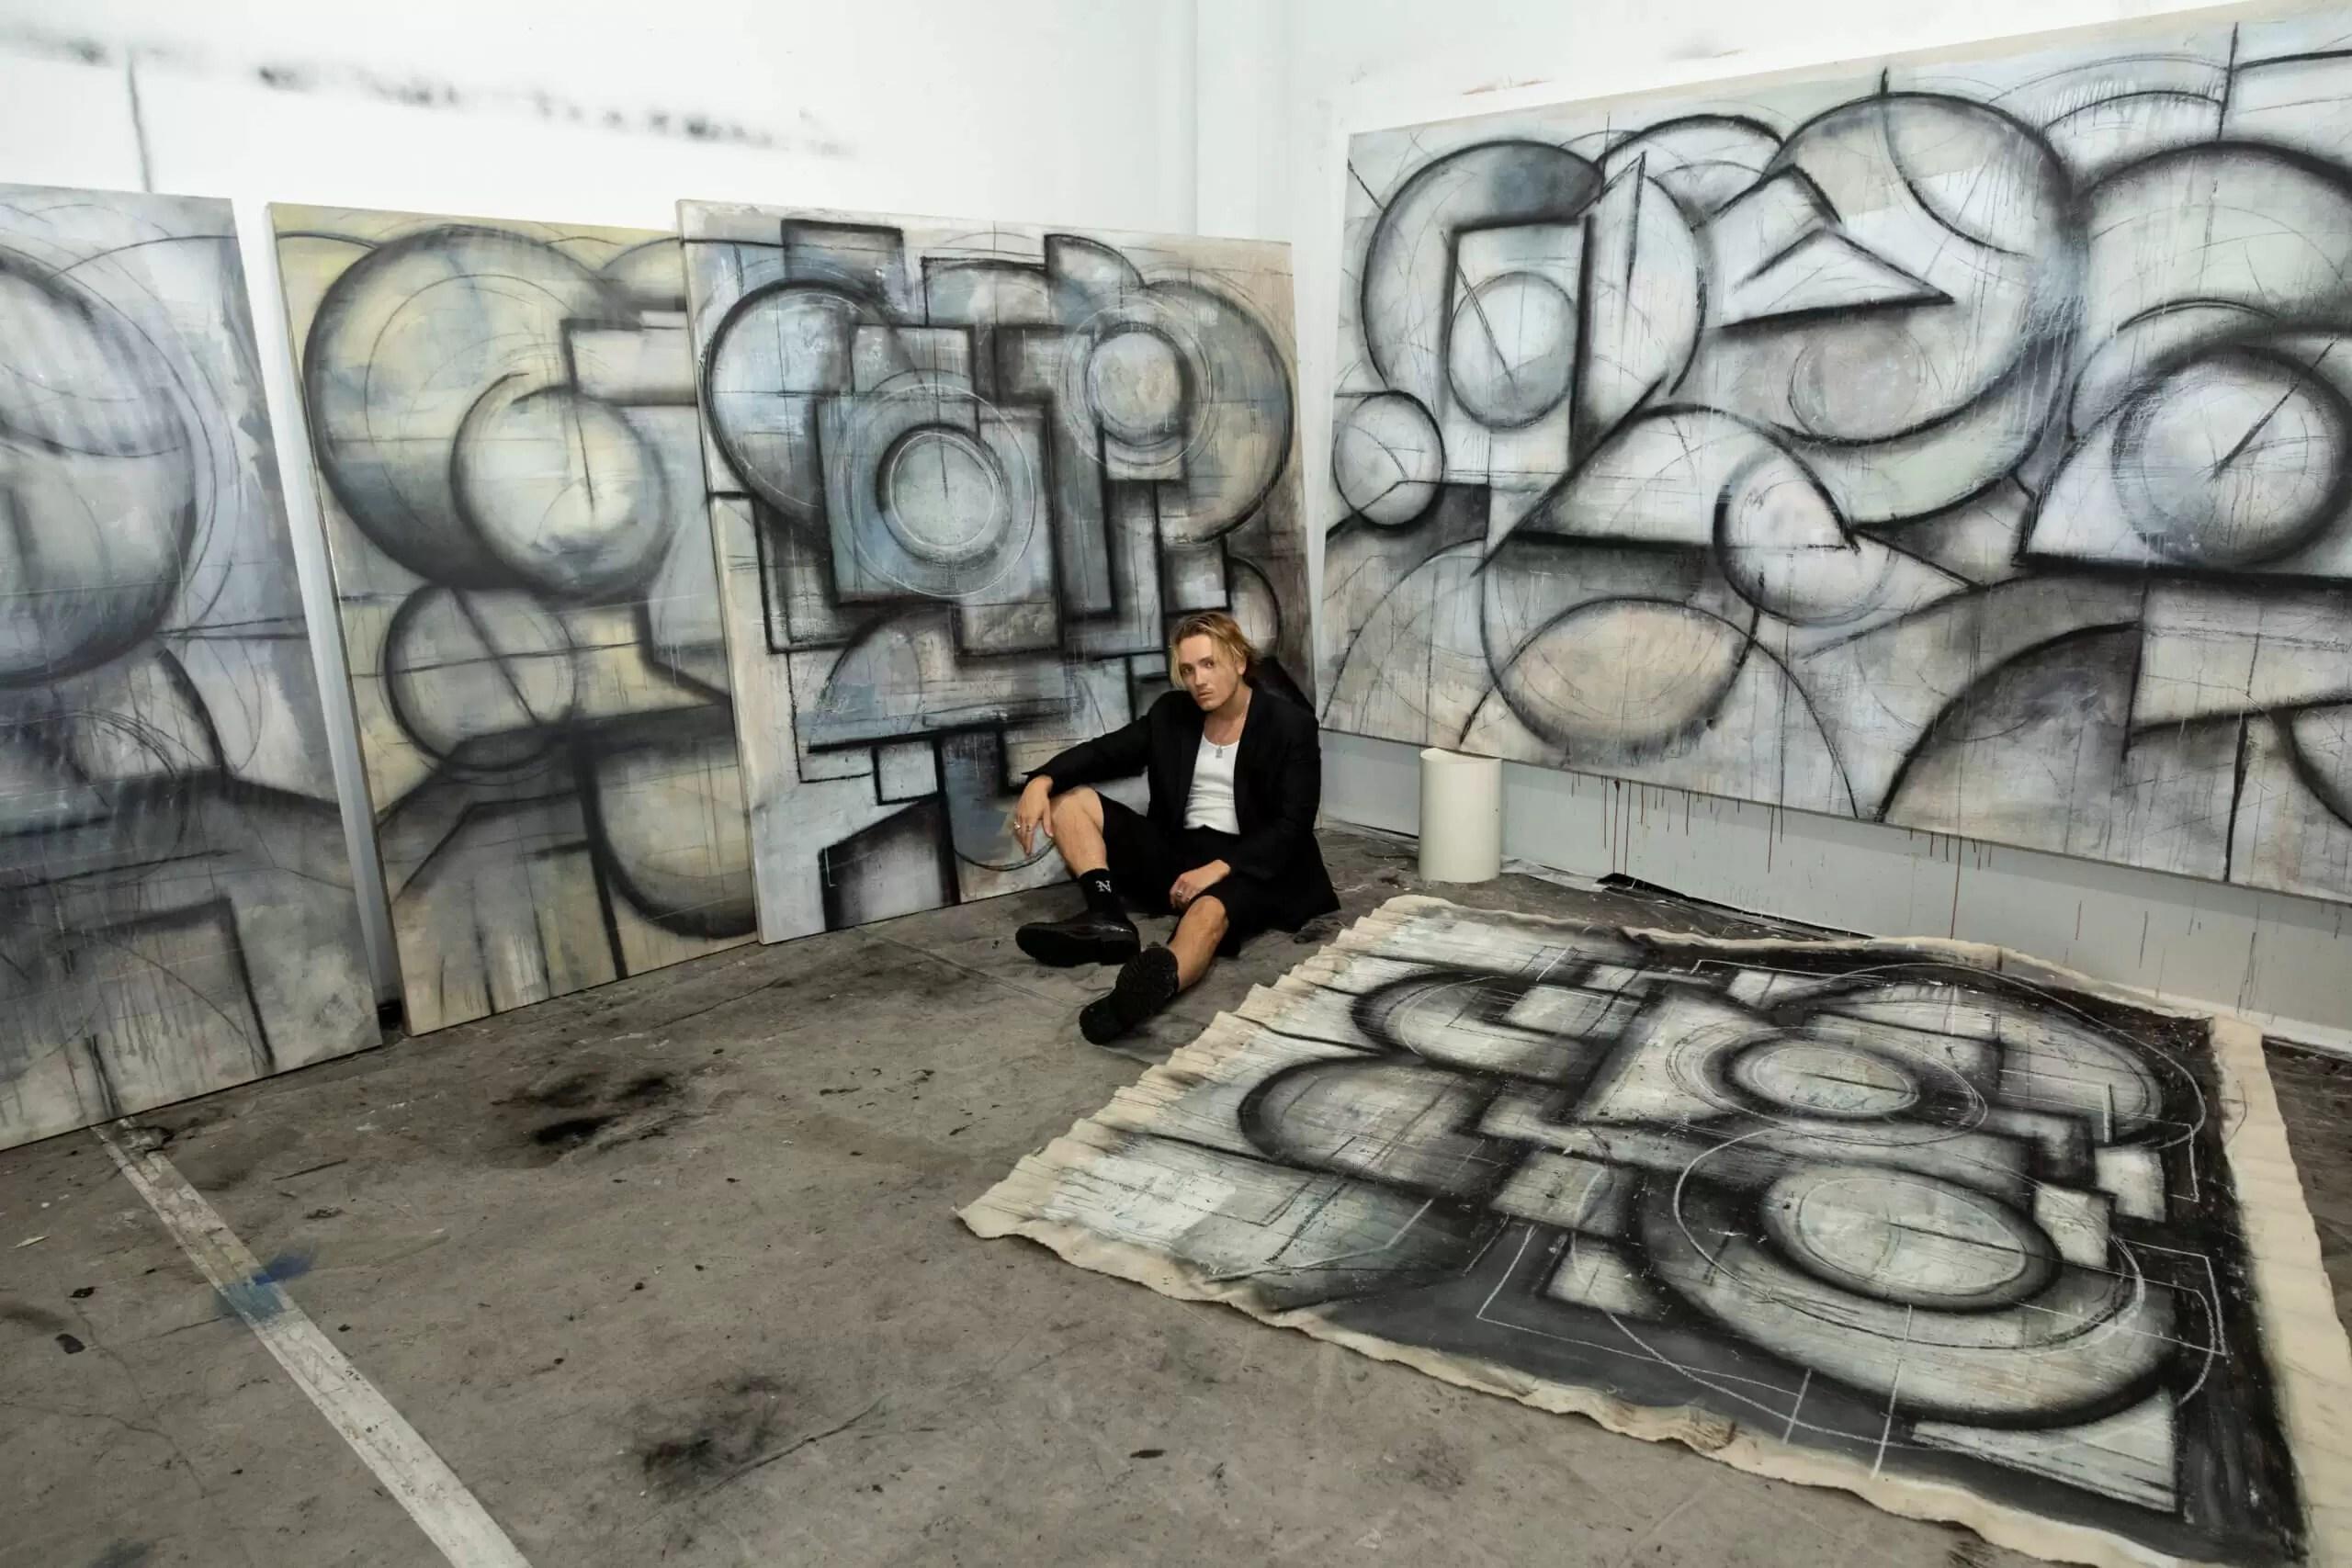 Devon DeJardin Exhibition: Umgestalter (Shifter of Shapes) | Art Plugged